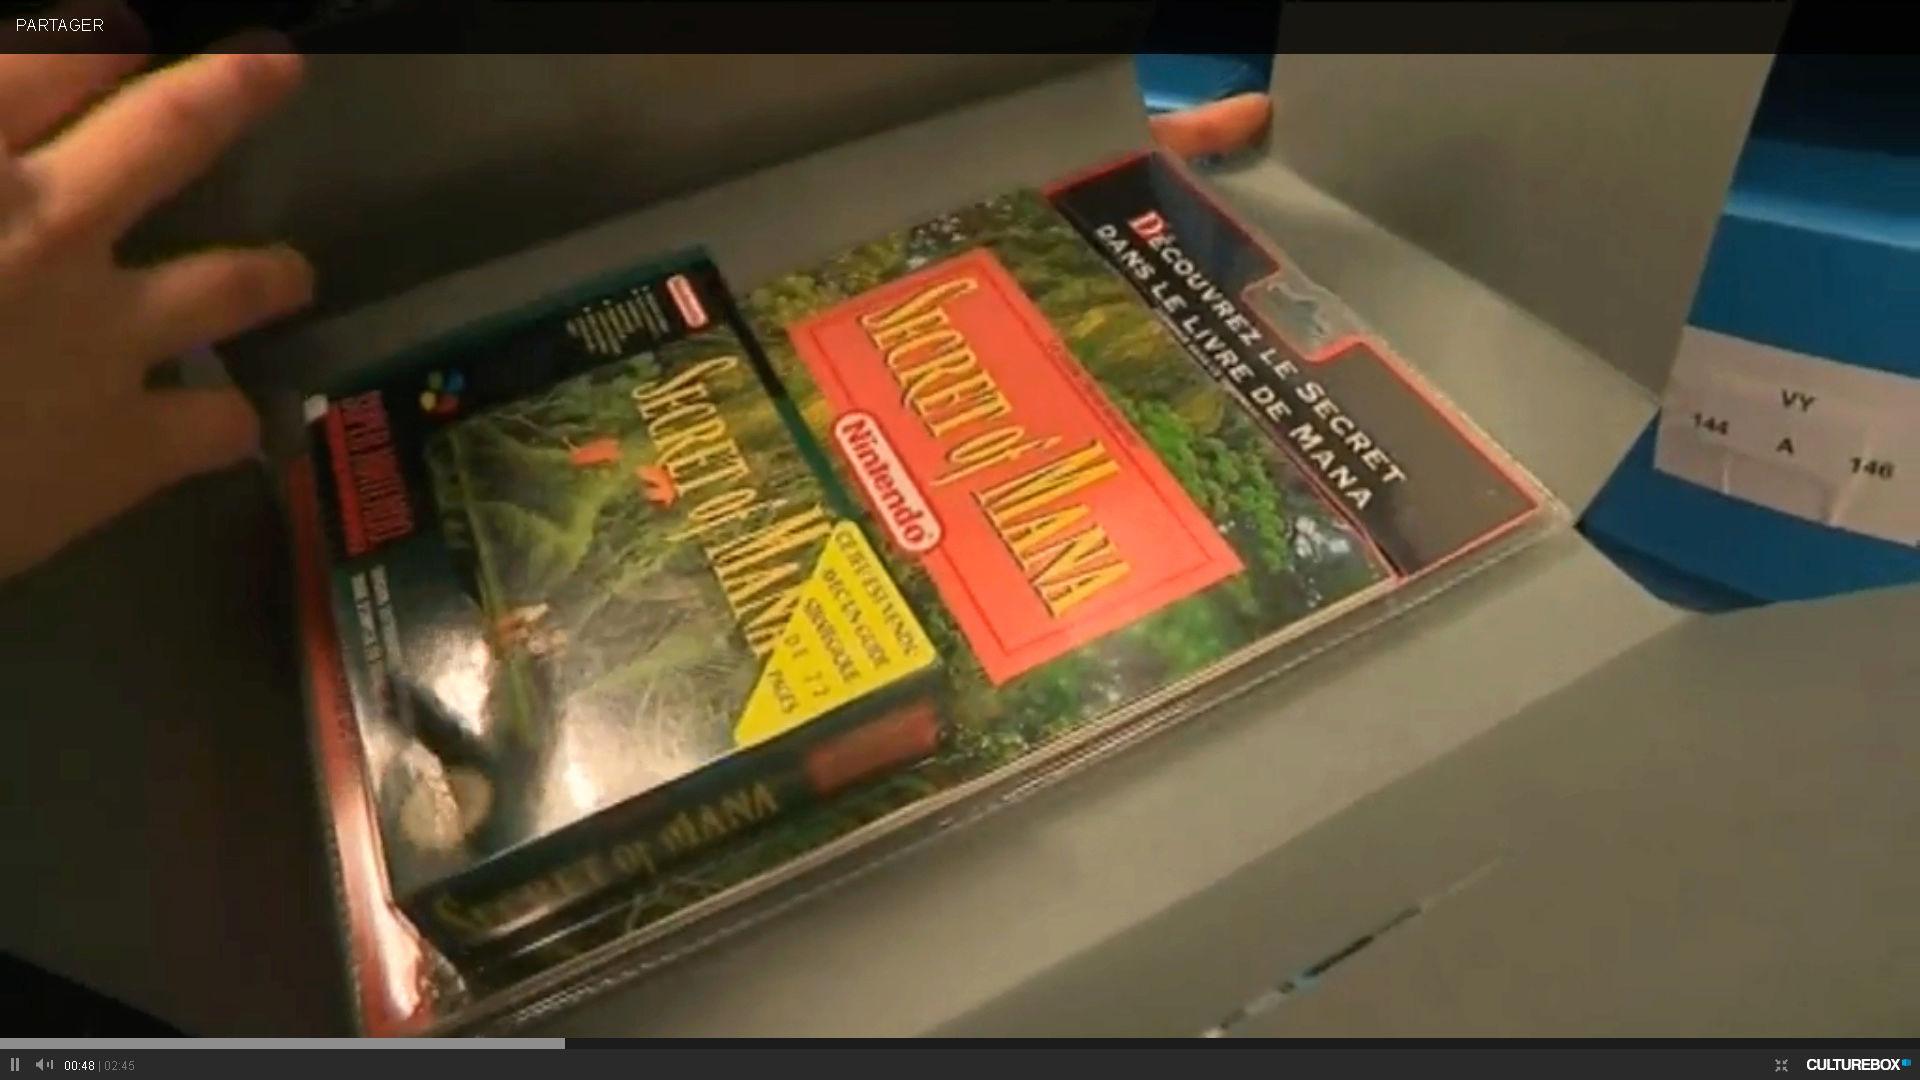 Reportage: La bibliotheque nationale stock pour le futur les JVs  Dadada10